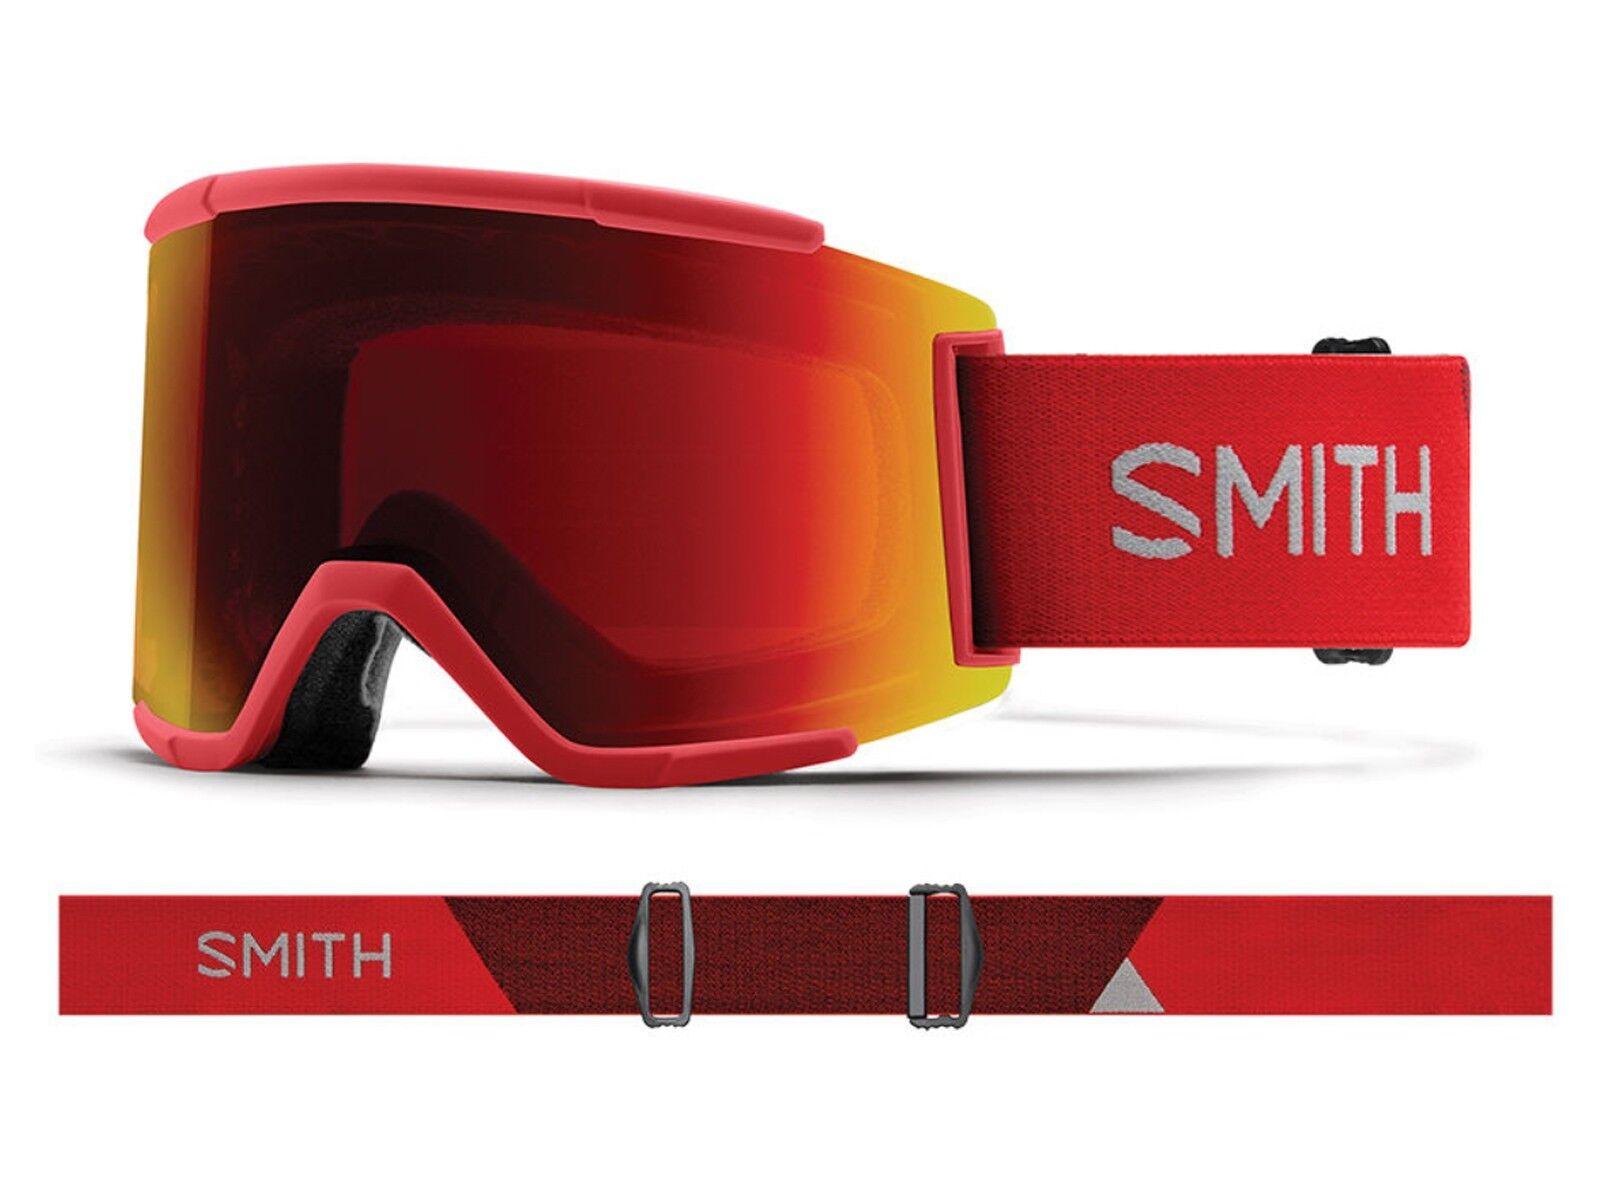 MASCHERA SCI SNOWtavola  LENTE OMAGGIO  SMITH  M00675 MP 2Y9  SQUAD XL CHROMAPOP